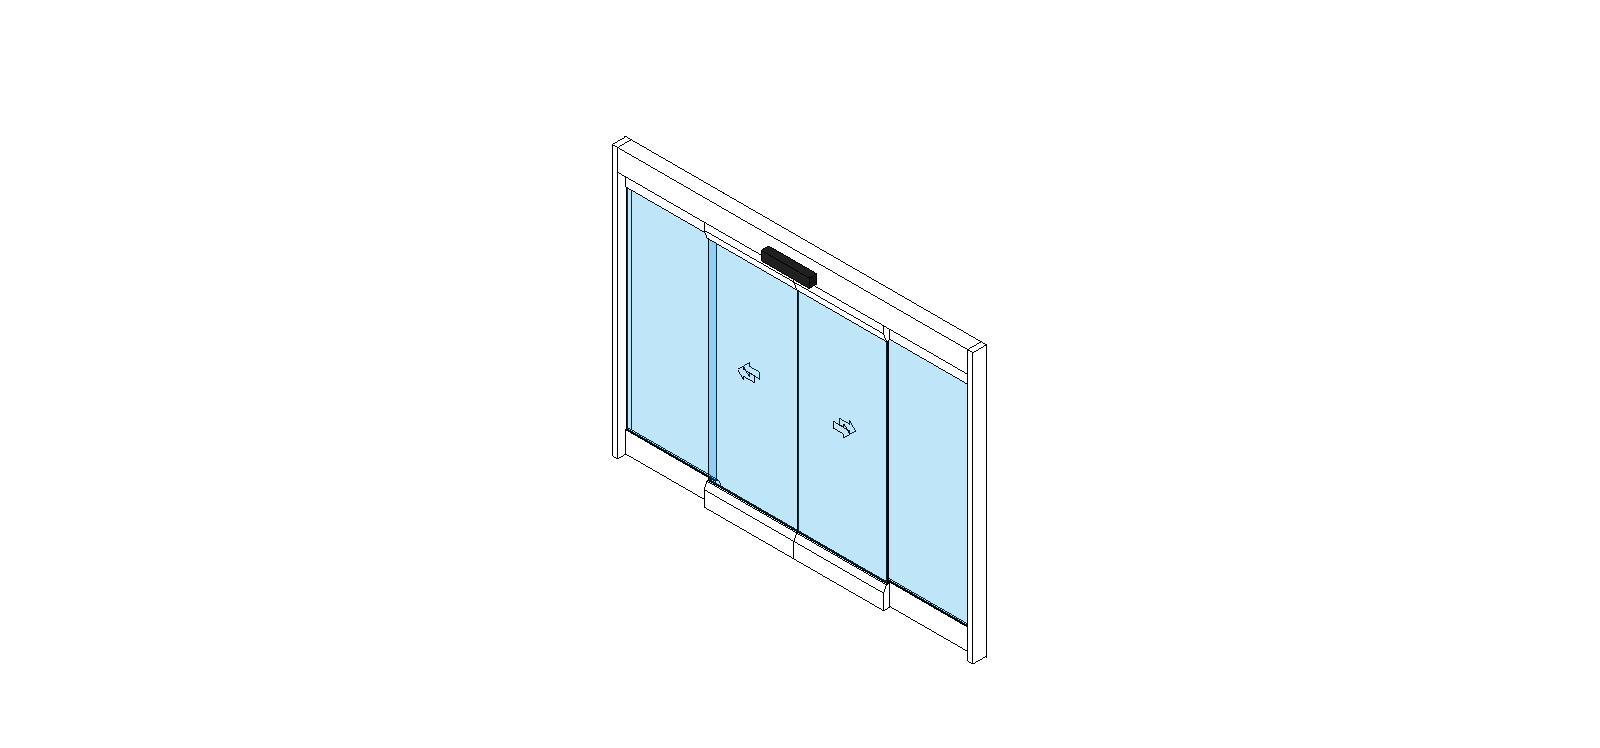 Assa abloy entrance systems sliding plastic doors bim for Sliding glass doors cad